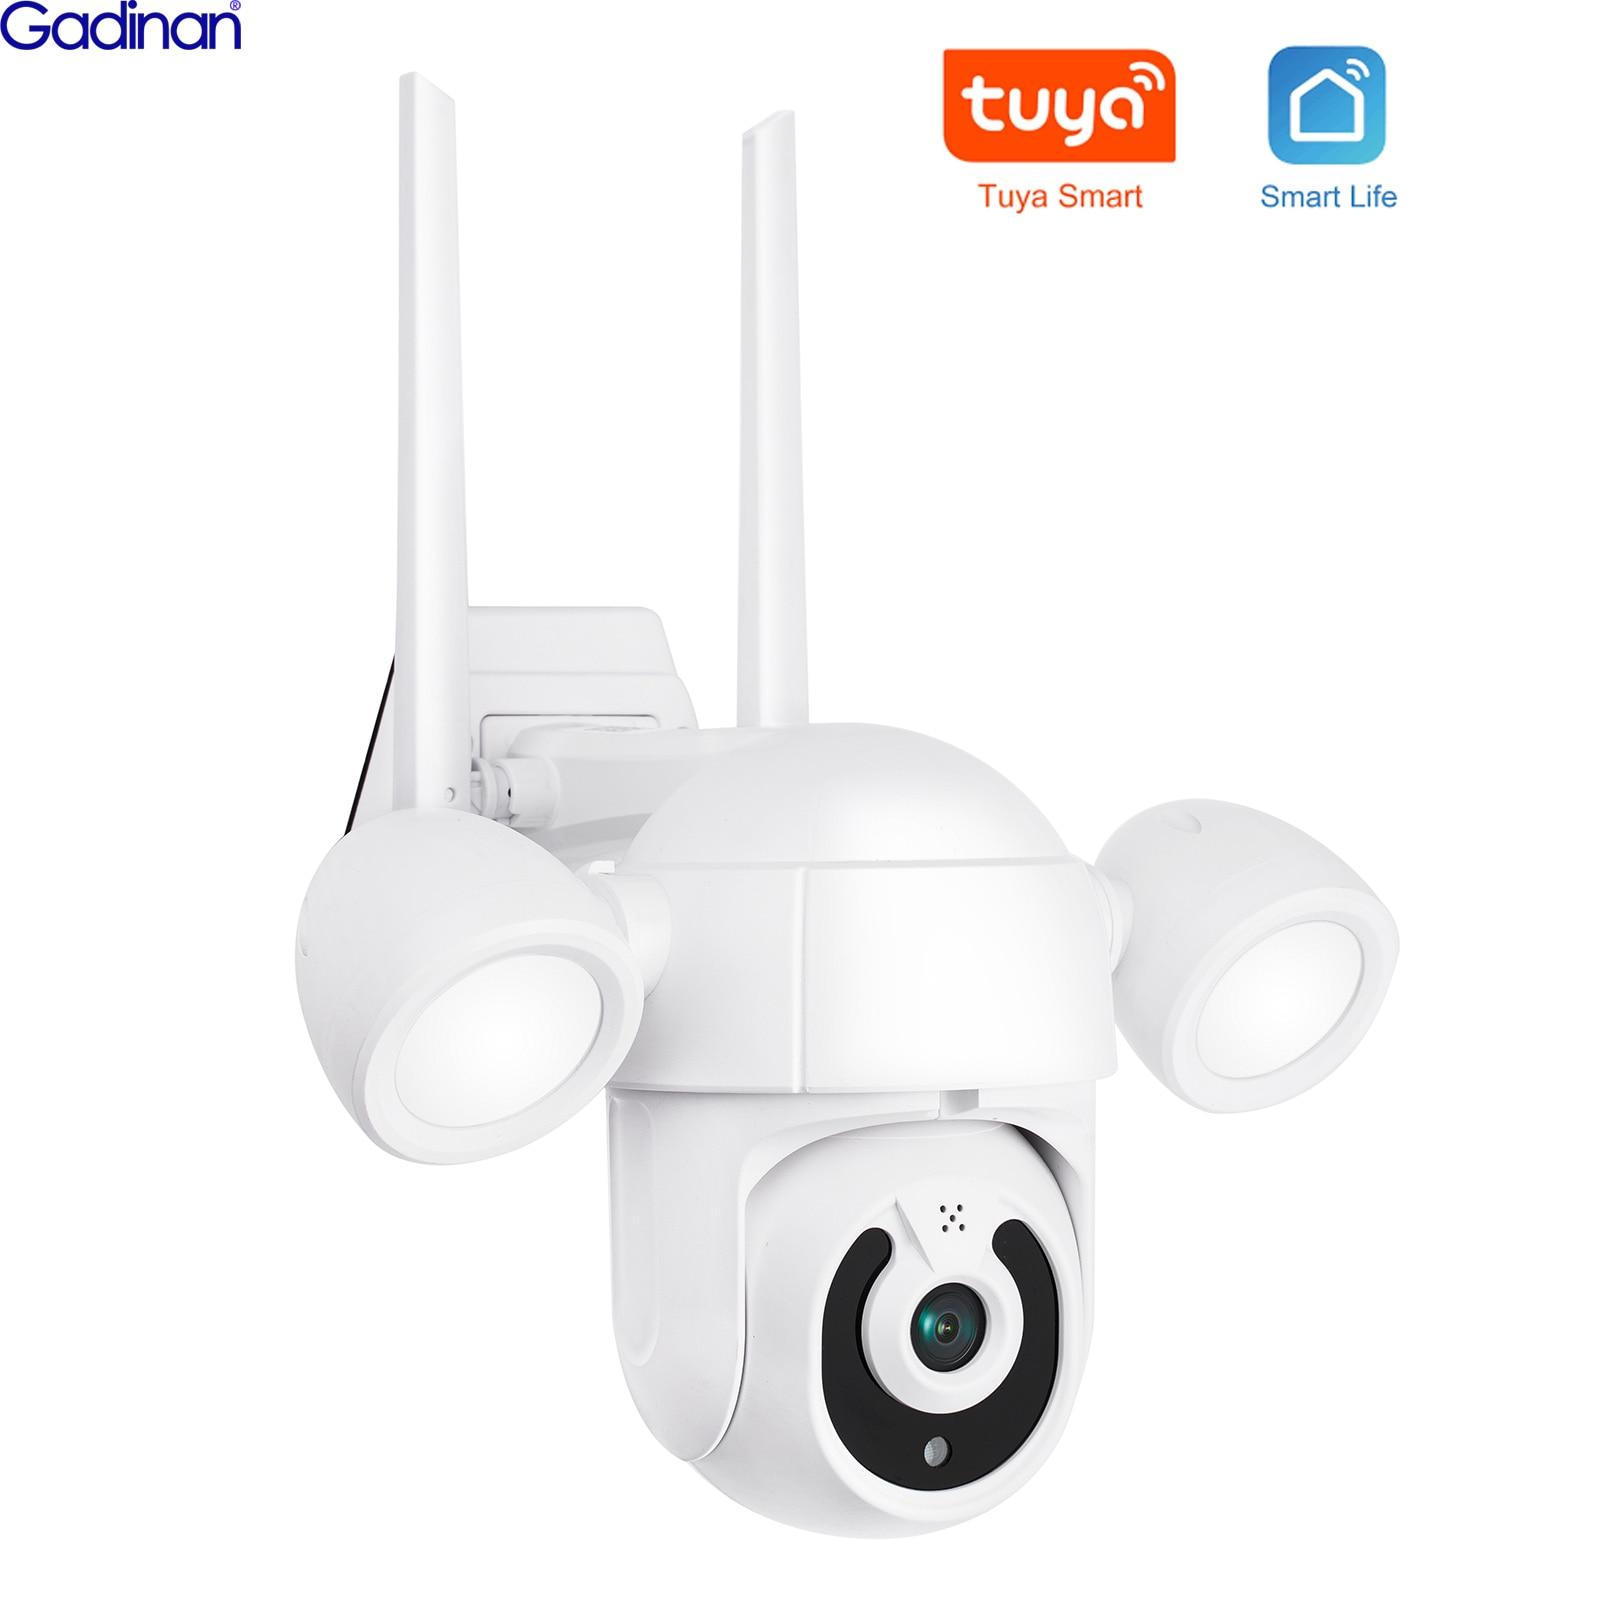 5MP PTZ IP Camera Tuya Wifi Outdoor AI Human Detection Audio 1080P Wireless Floodlight Security CCTV